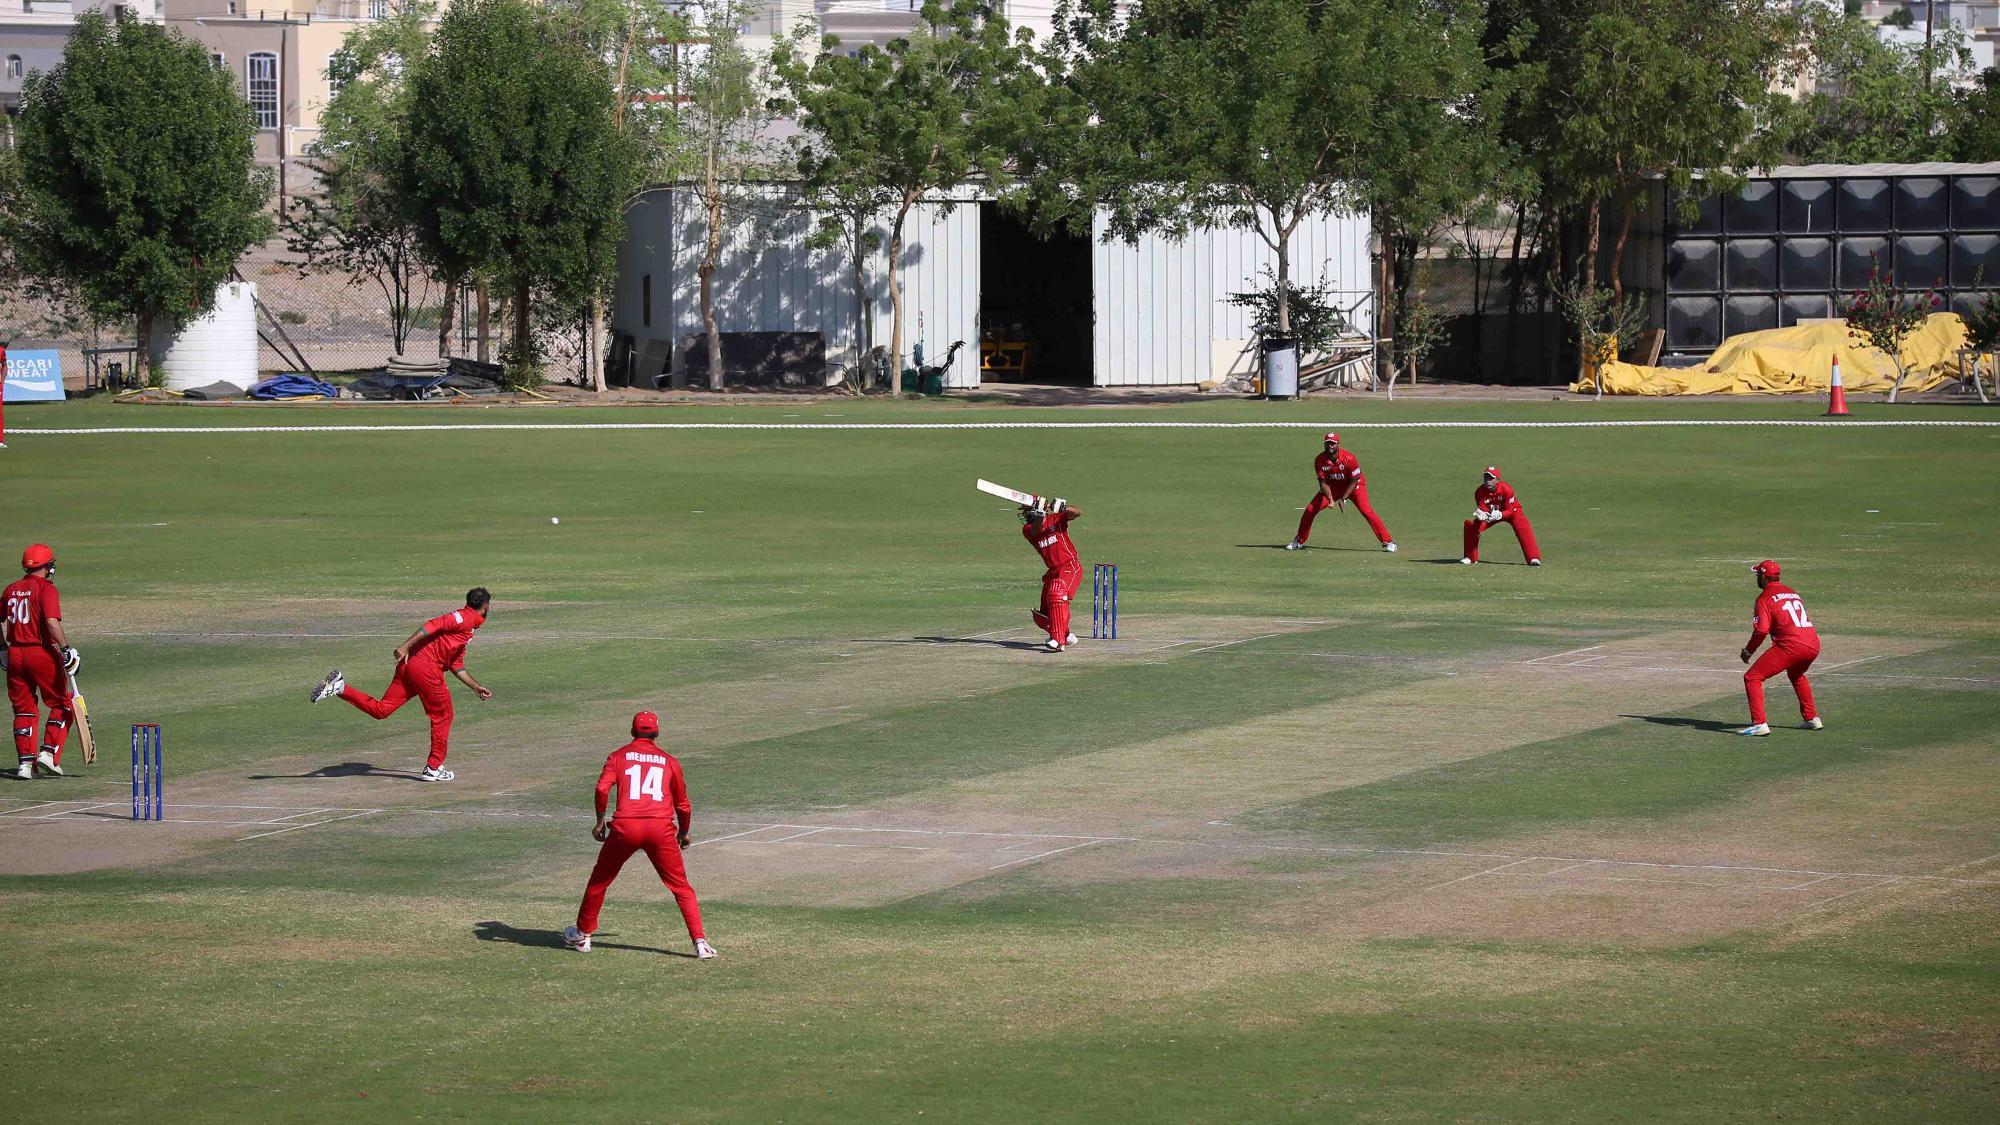 Vi gav Oman en lige kamp 1